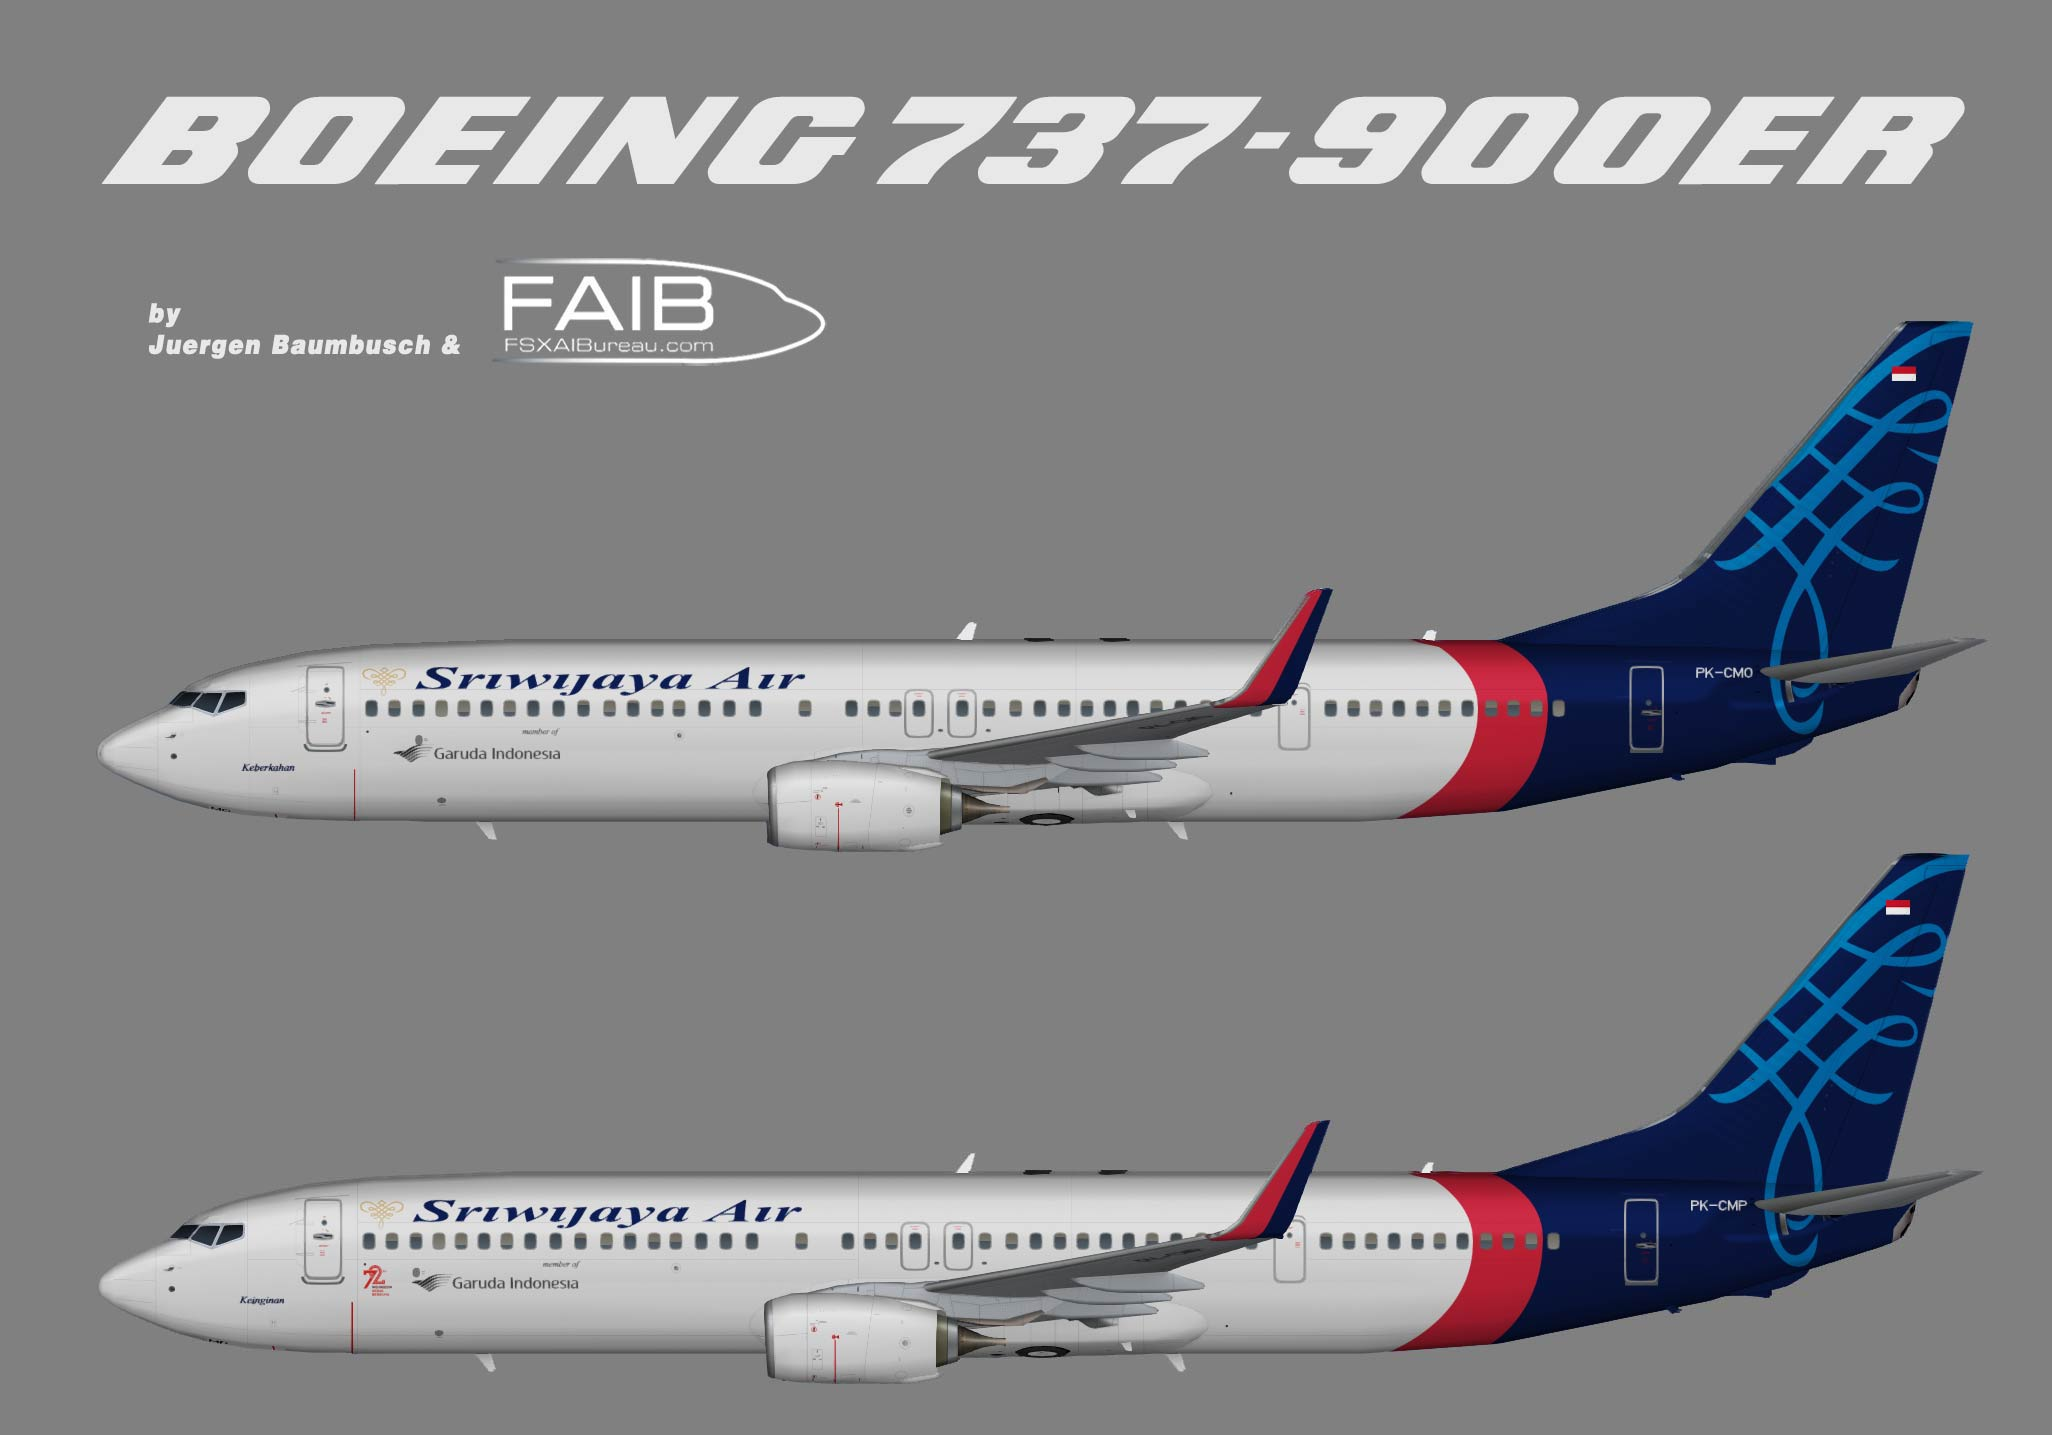 Sriwijaya Air Boeing 737-900ER